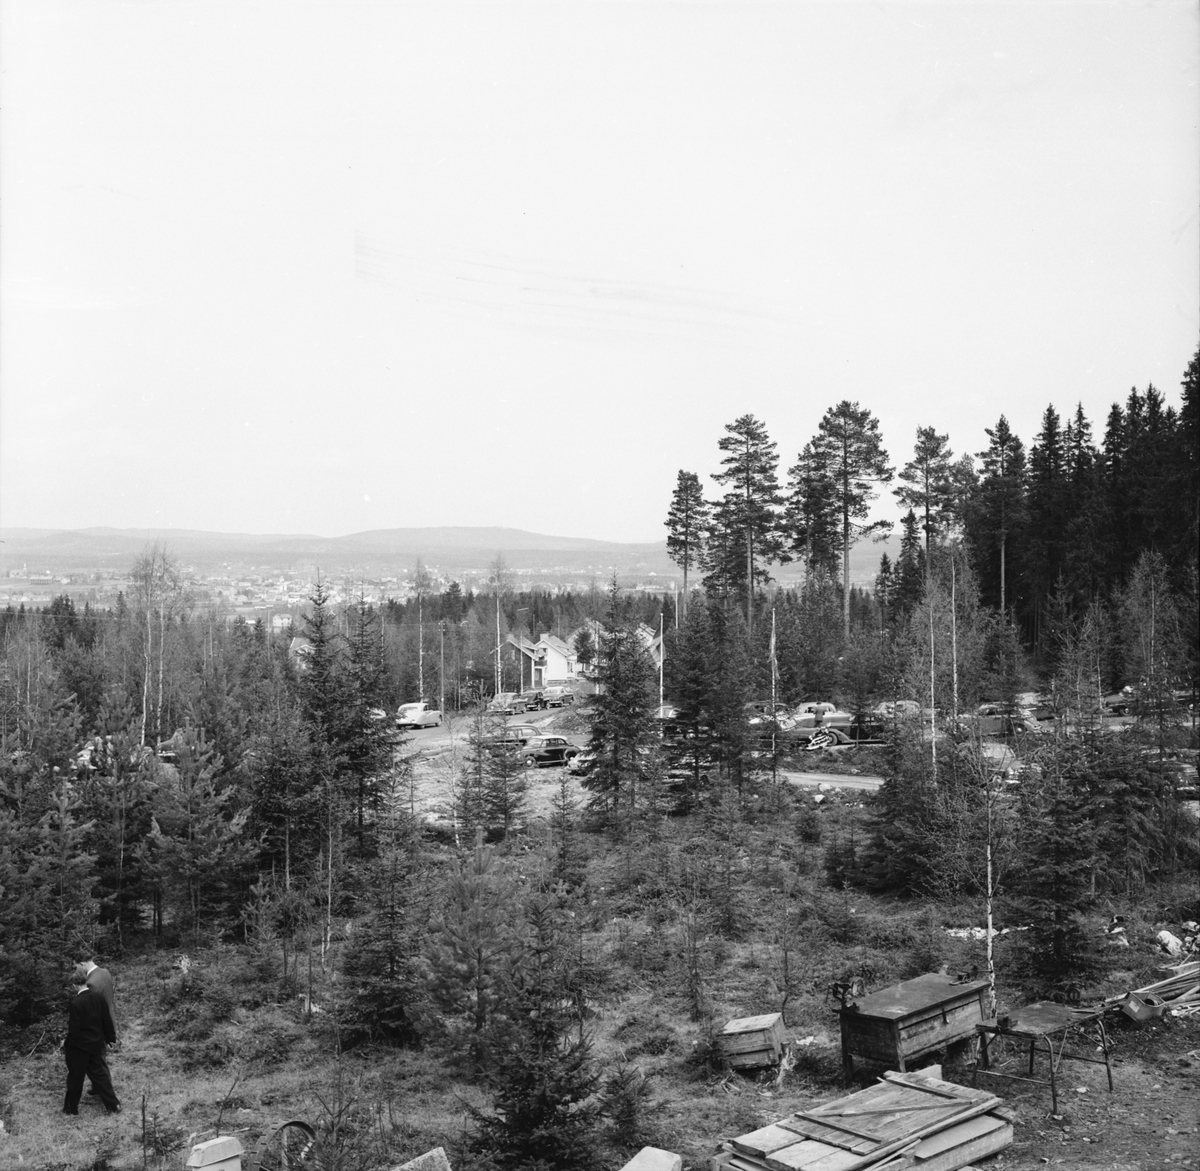 Hantverkarmöte, Edsbyns Hantverkargård. 18 - 19/5 1957